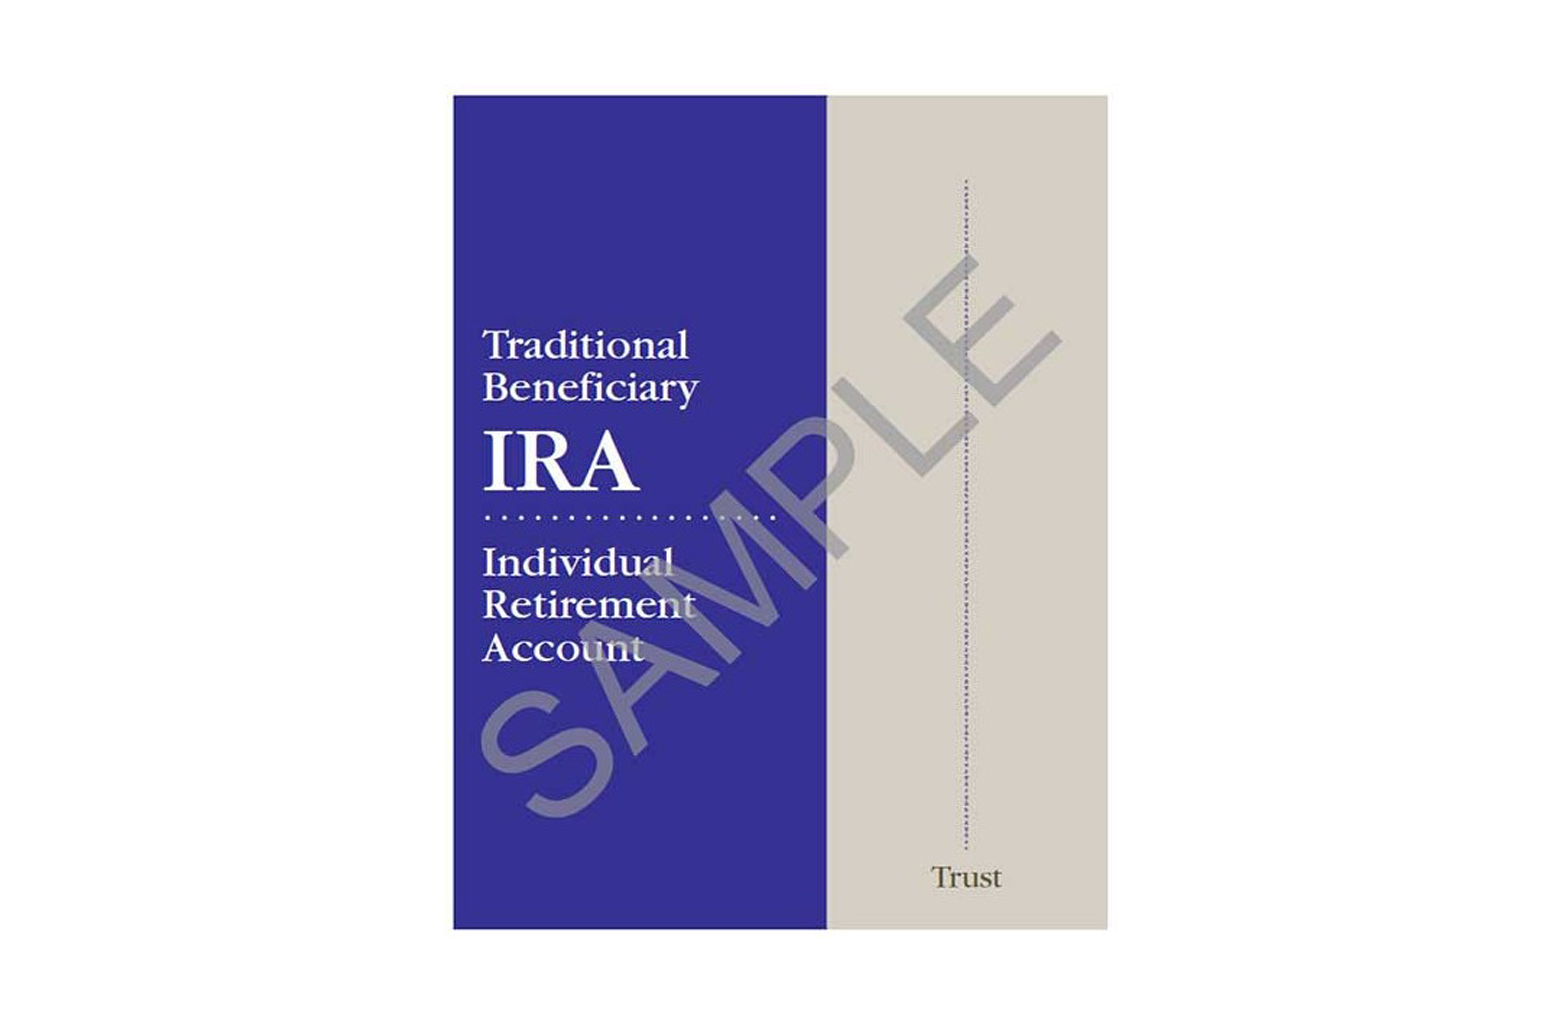 Traditional Beneficiary IRA Organizer - Trust sample